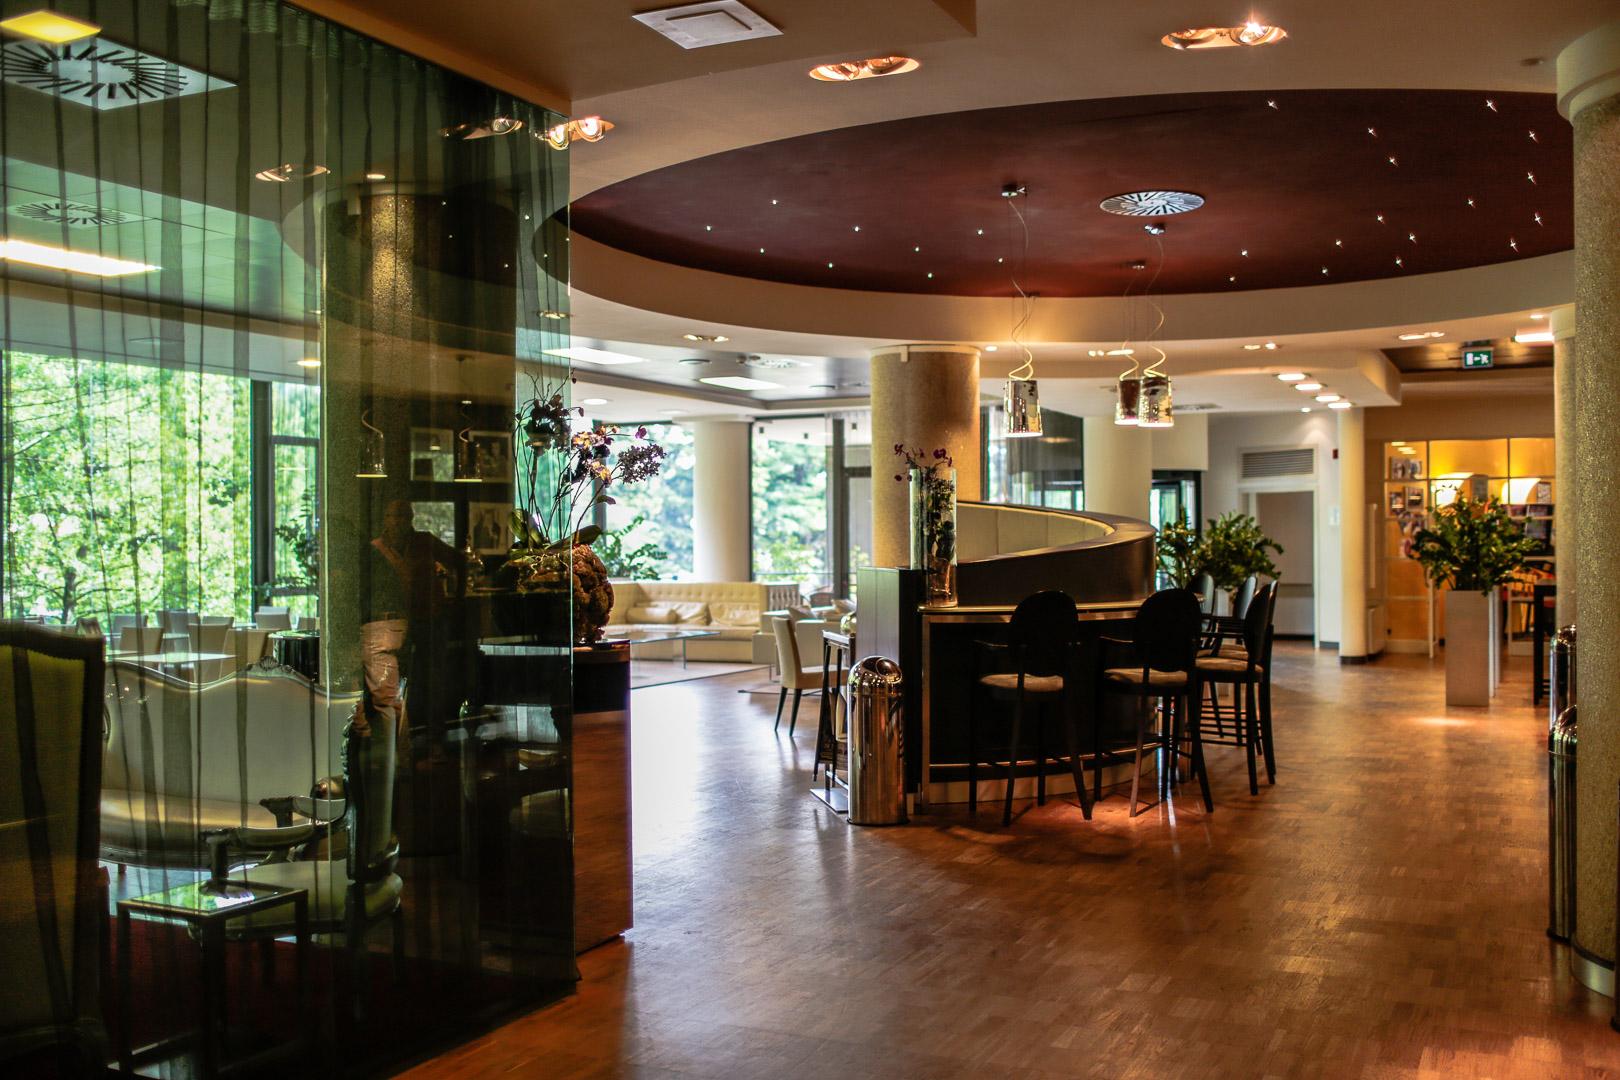 Hall-Euroterme Roseo Resort-Bagno di Romagna-Forlì-Cesena